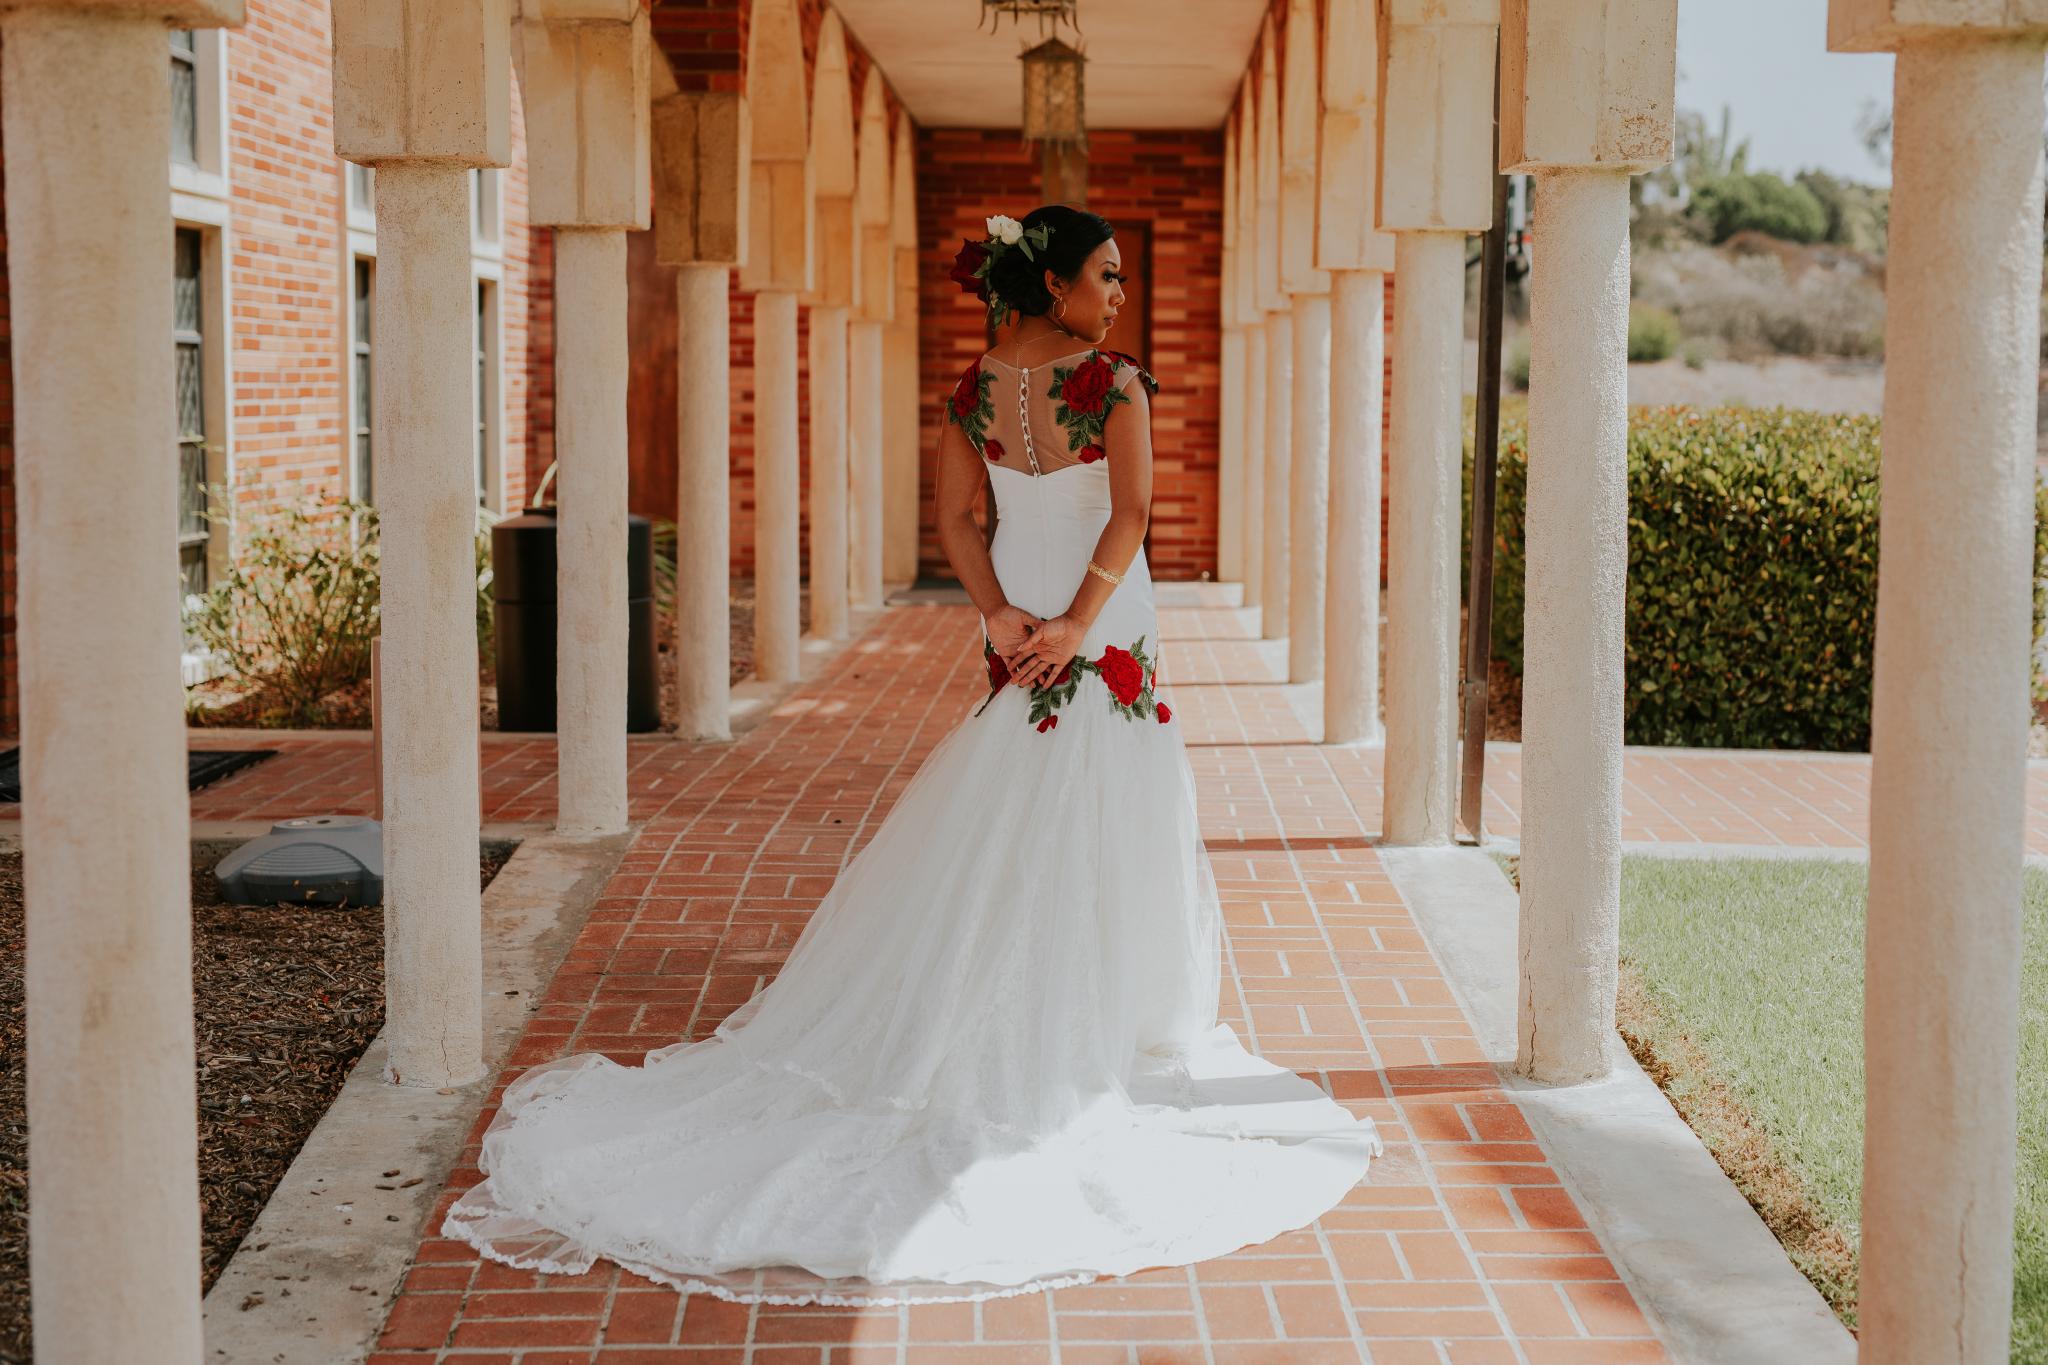 San Diego Wedding Photographer | bride posing before the wedding